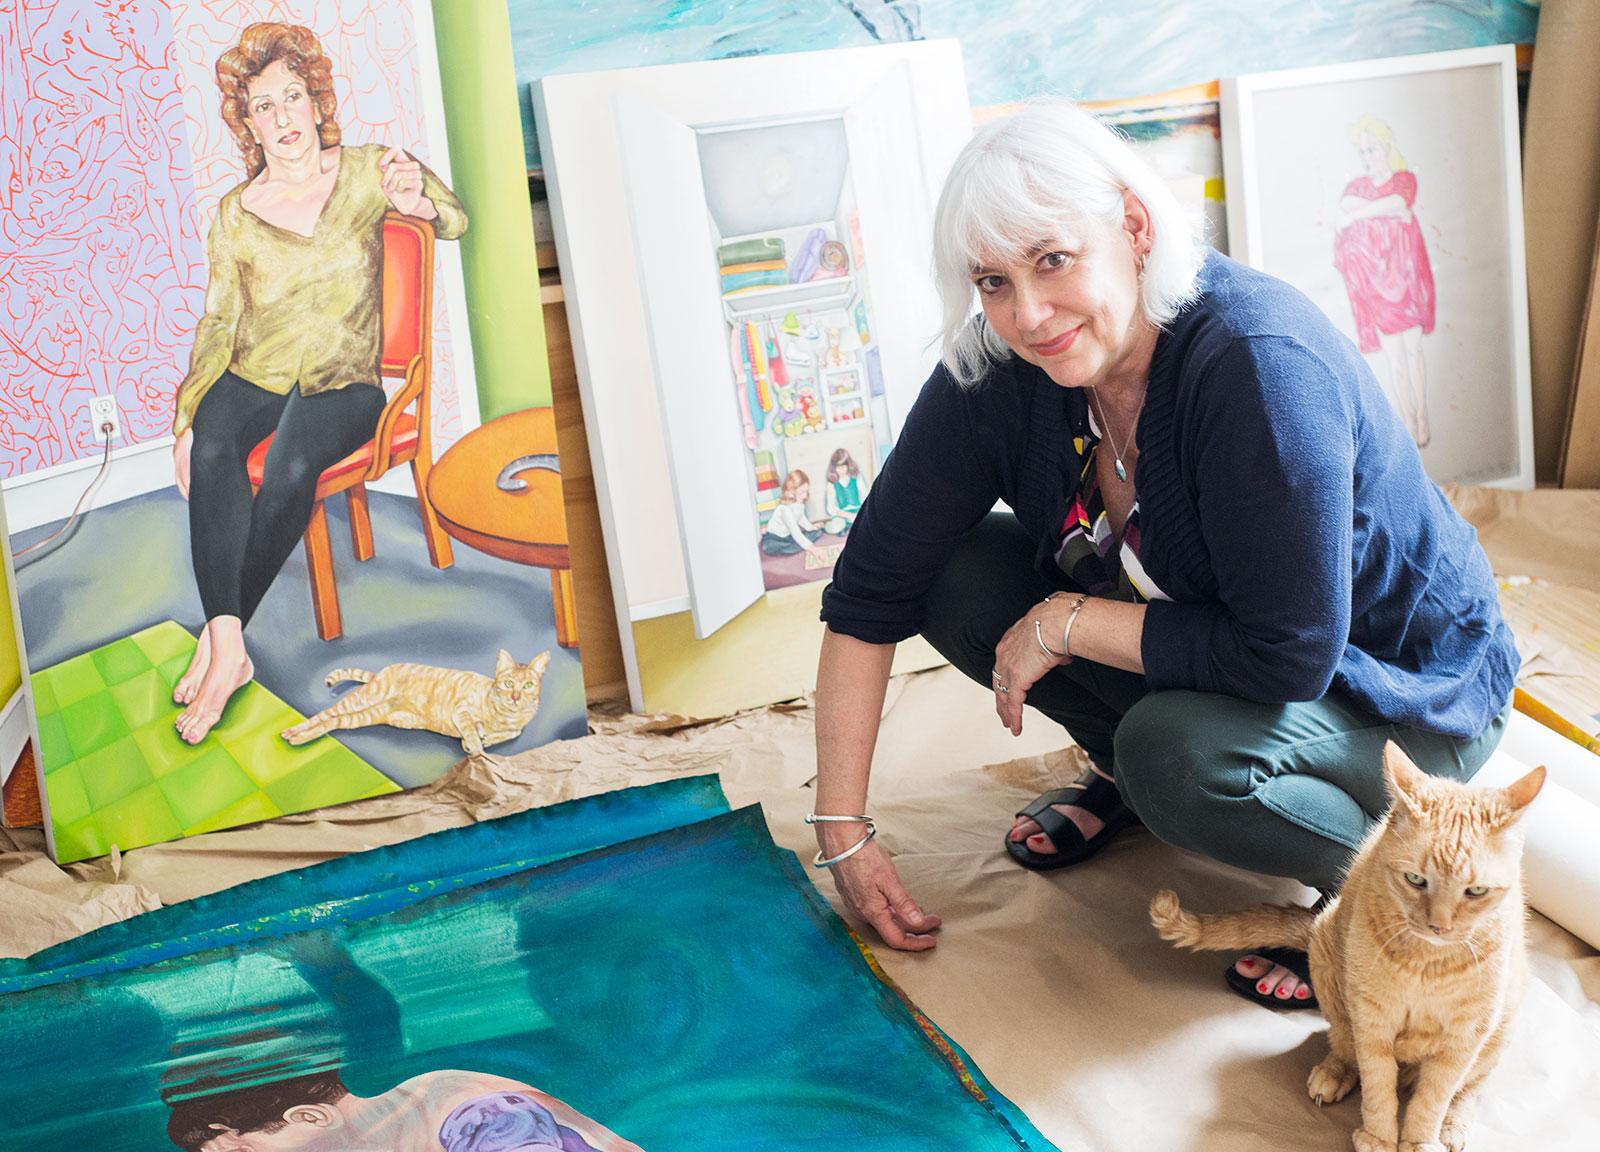 Artist Robin Tewes